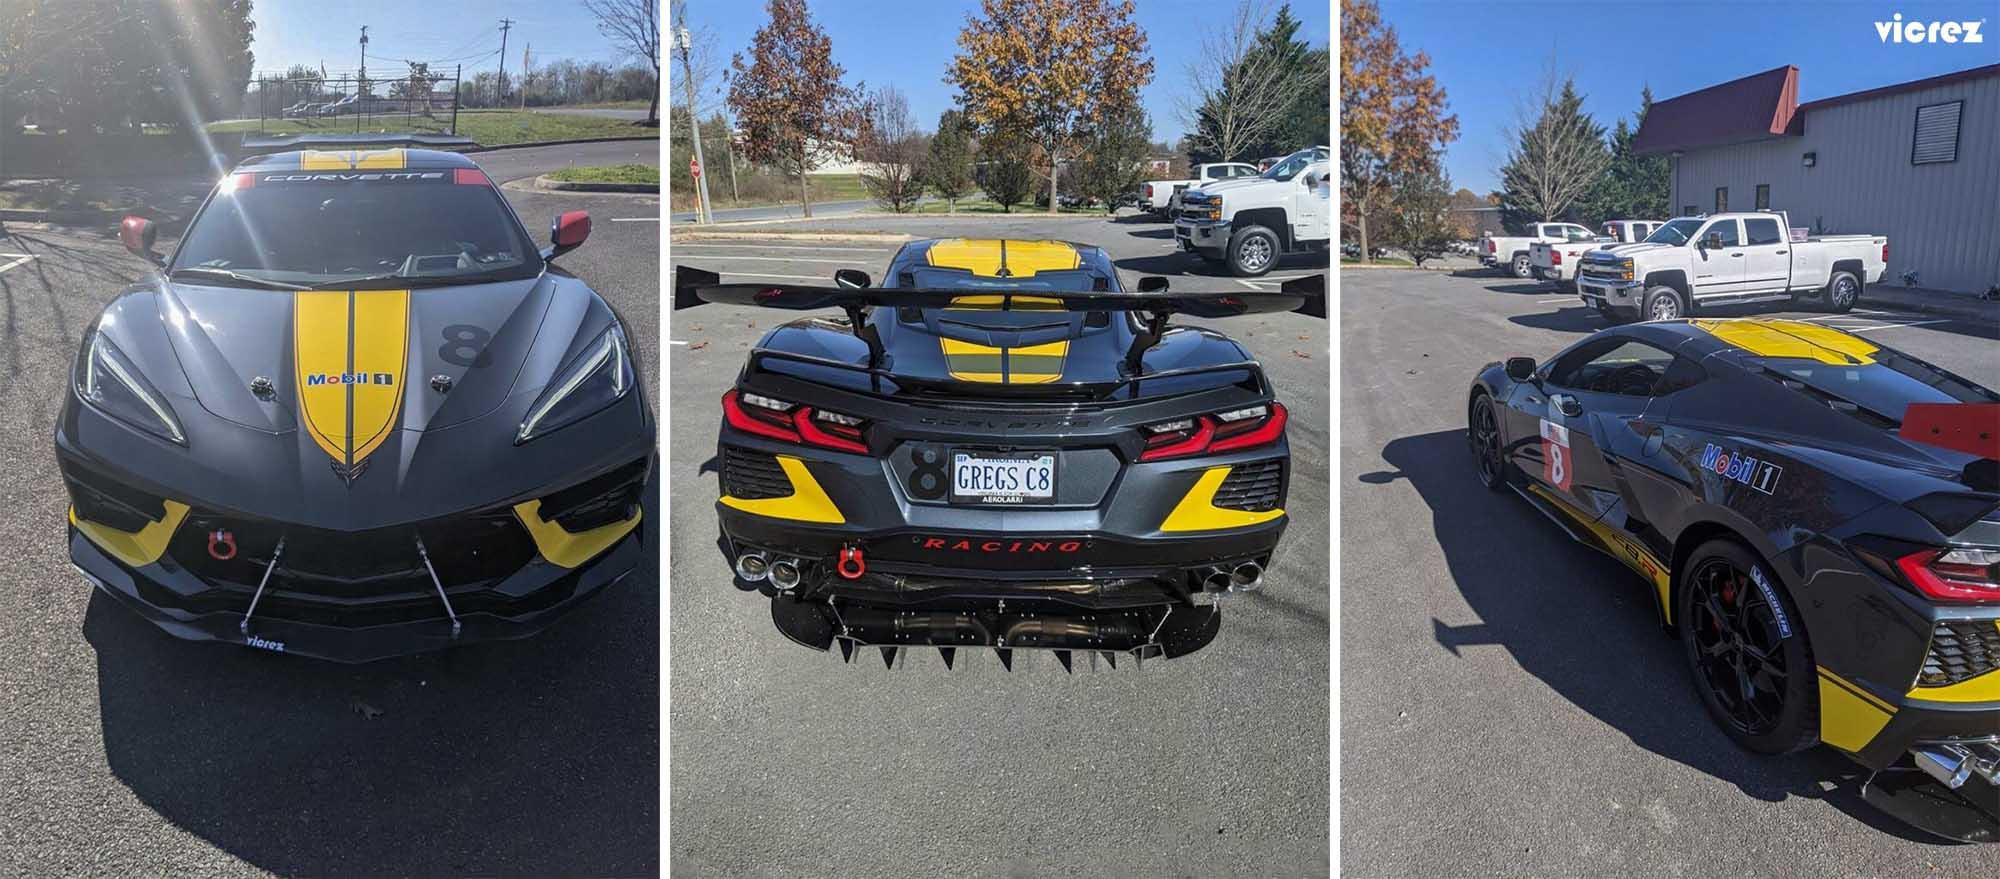 Vicrez R1 Rear Diffuser vz102106 | Chevrolet Corvette C8 2020-2021